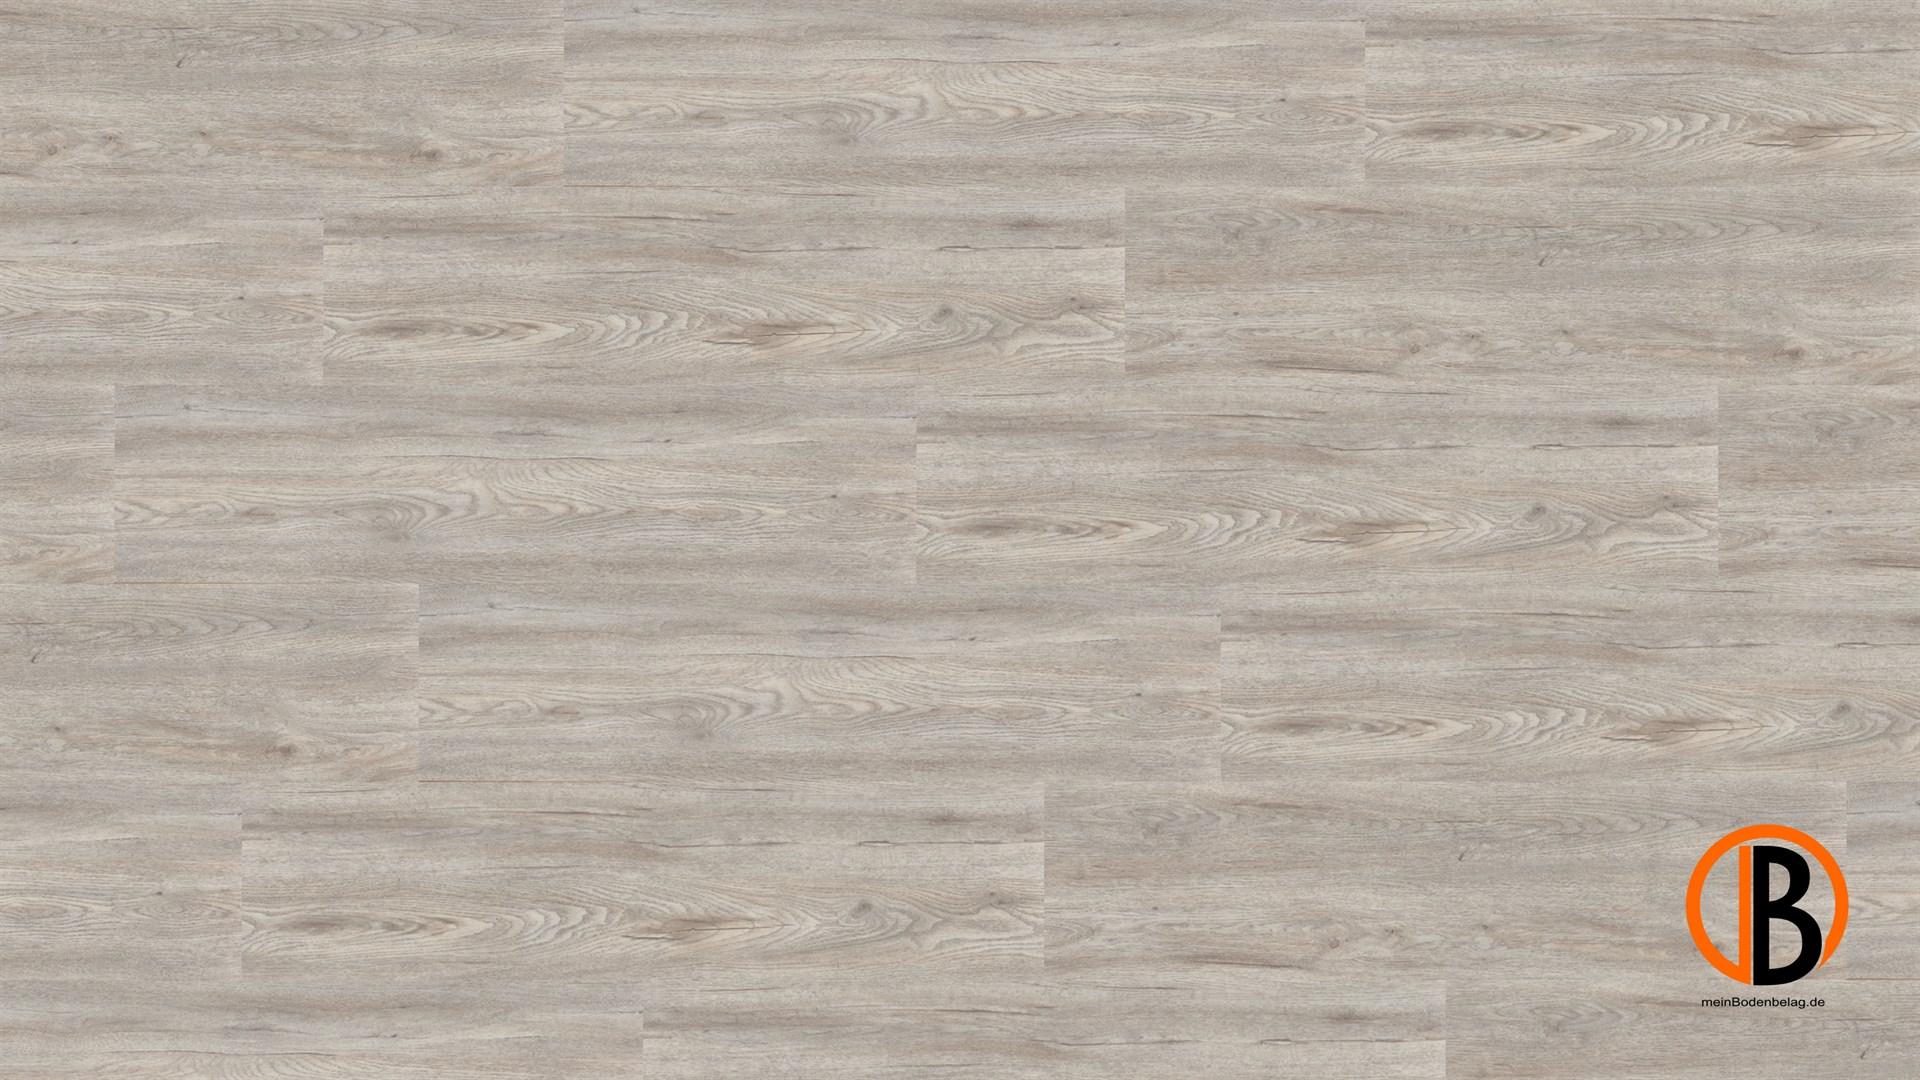 CINQUE KWG DESIGNERVINYL ANTIGUA CLASSIC SHEETS | 10000282;0 | Bild 1